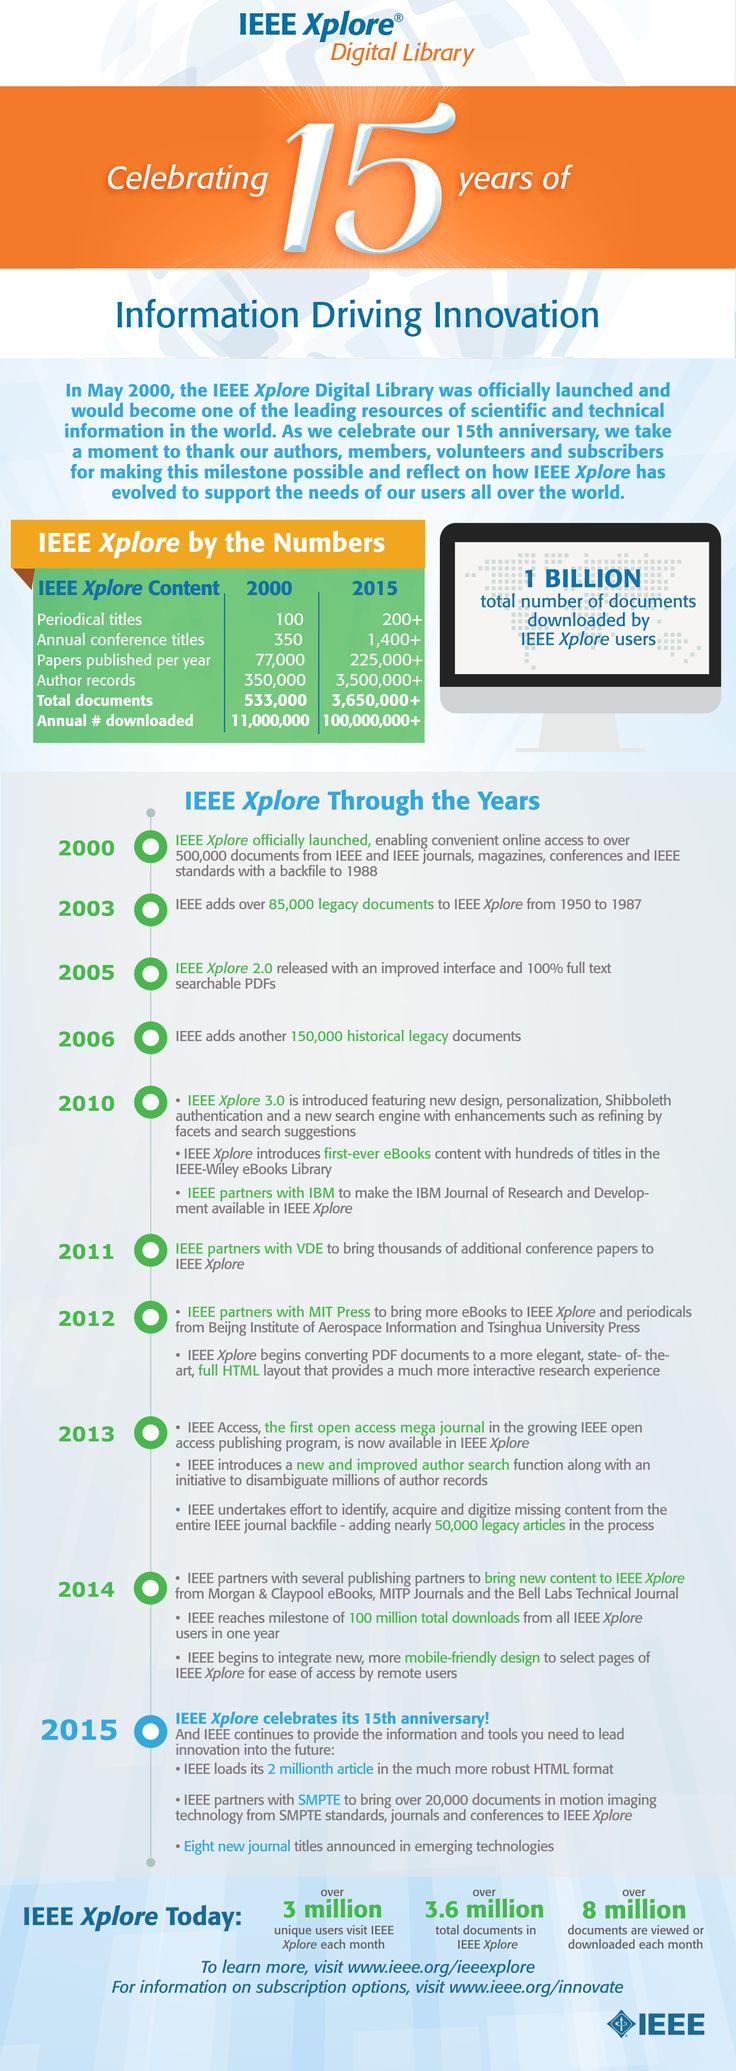 IEEE Xplore celebrates 15 years of information driving innovation   #IEEE #IEEEXplore #infographic